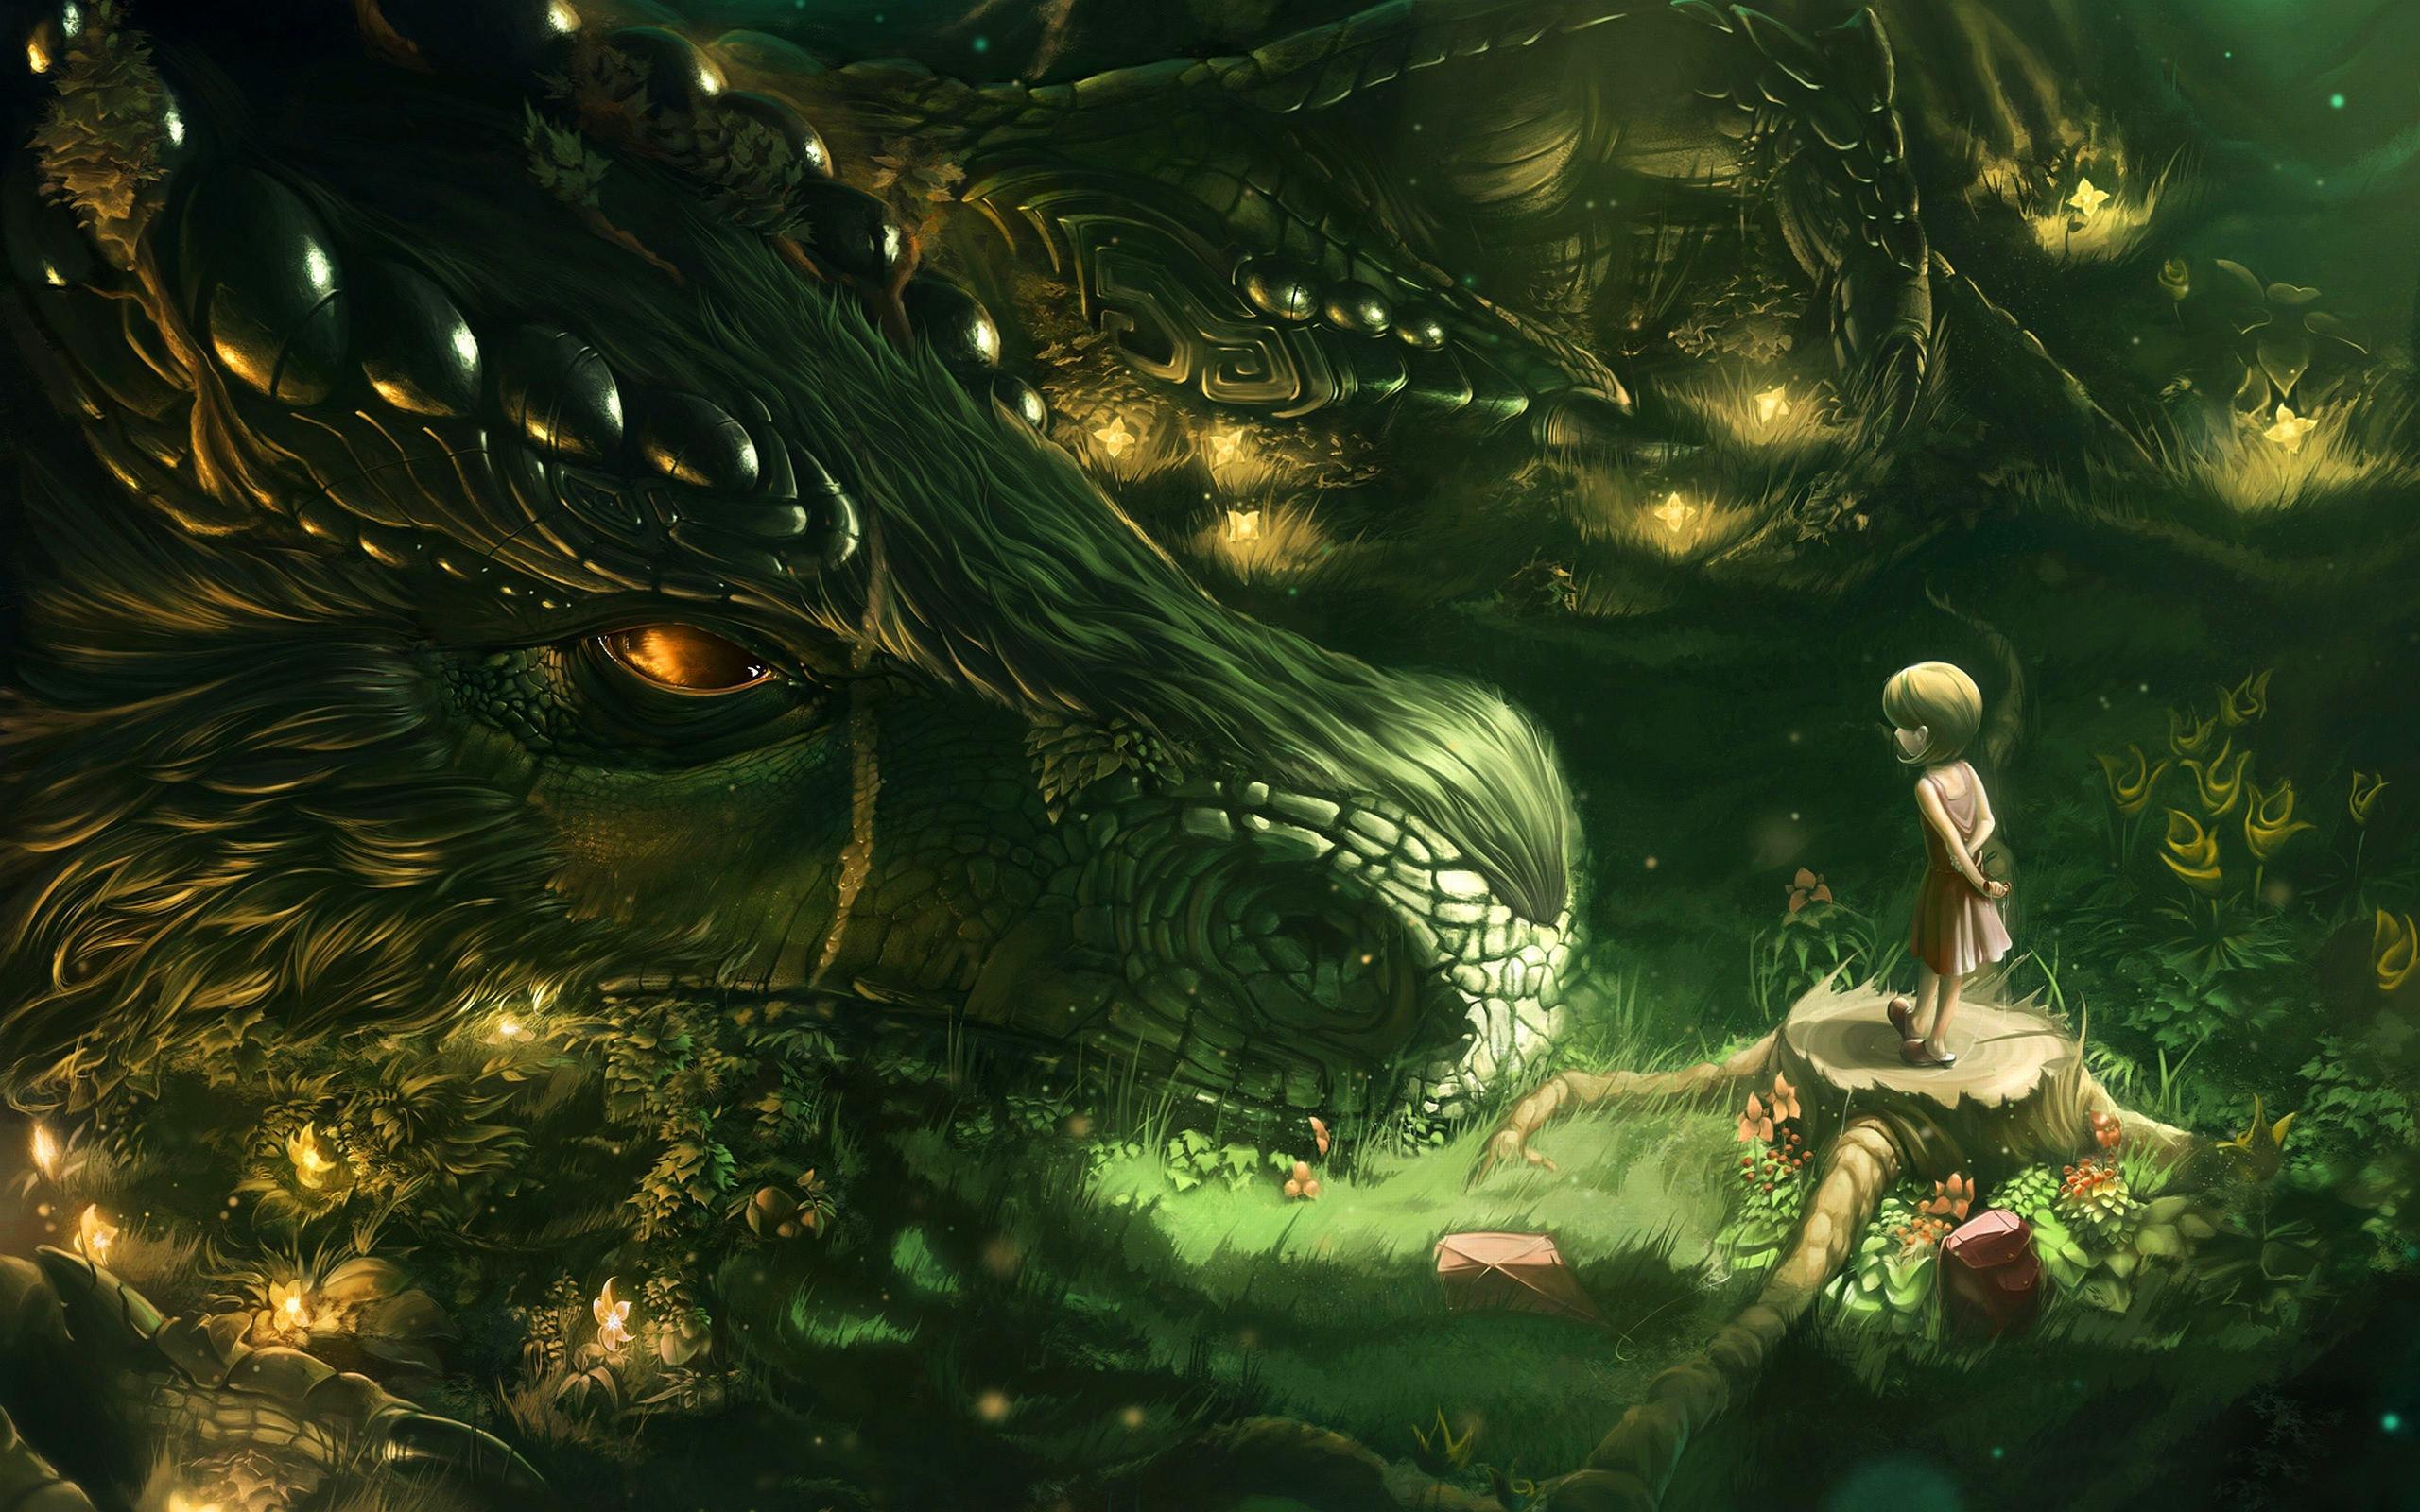 Epic Dragon Wallpaper ·① WallpaperTag